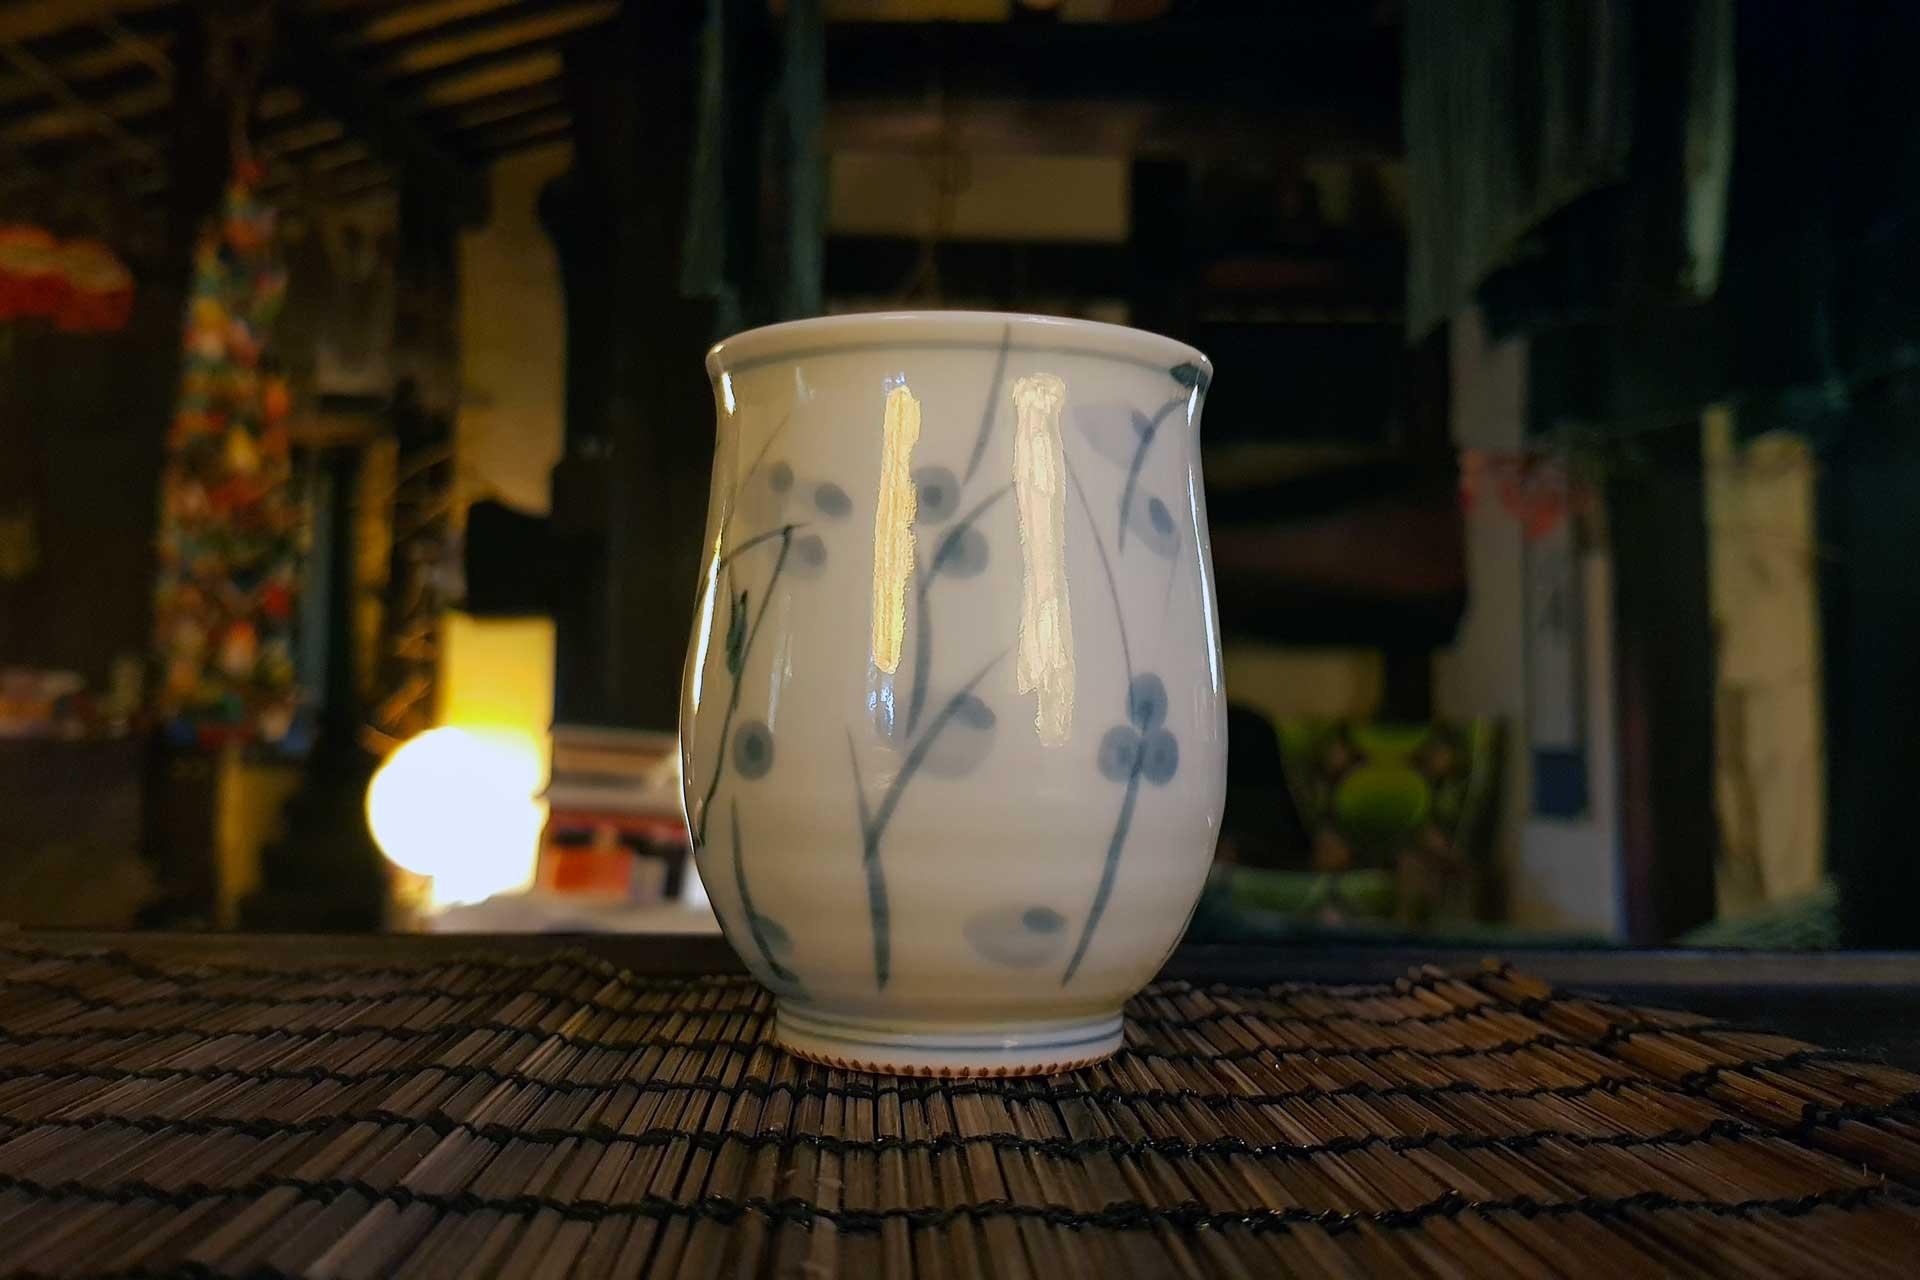 Te Giapponese Wabi Sabi Culure